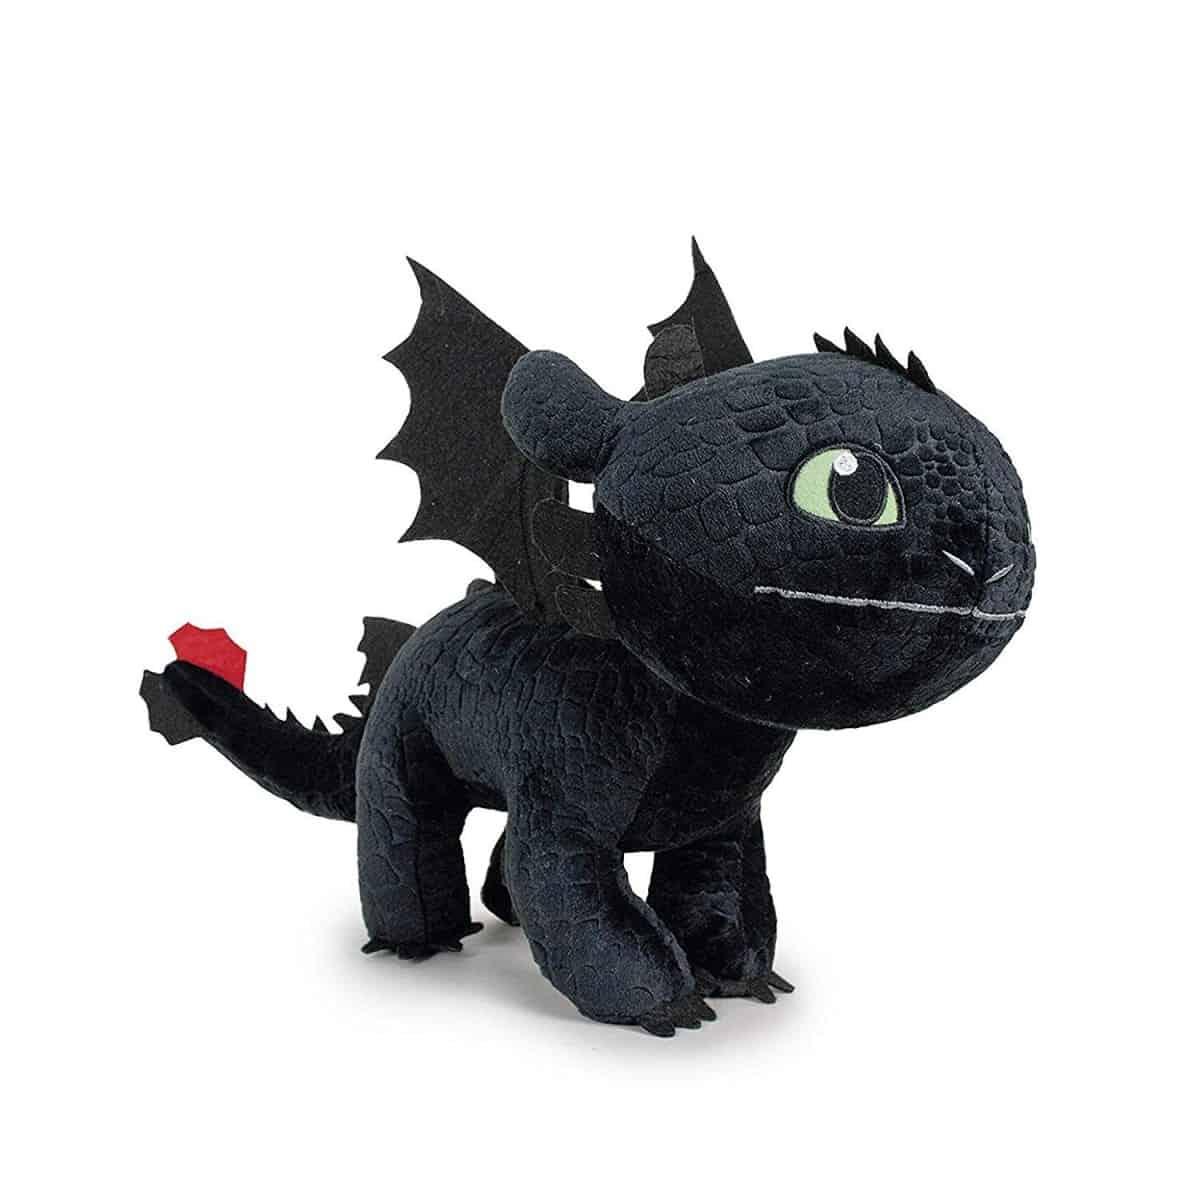 Peluche Dragon Croque Mou 26 Cm Barrado Bellepeluche